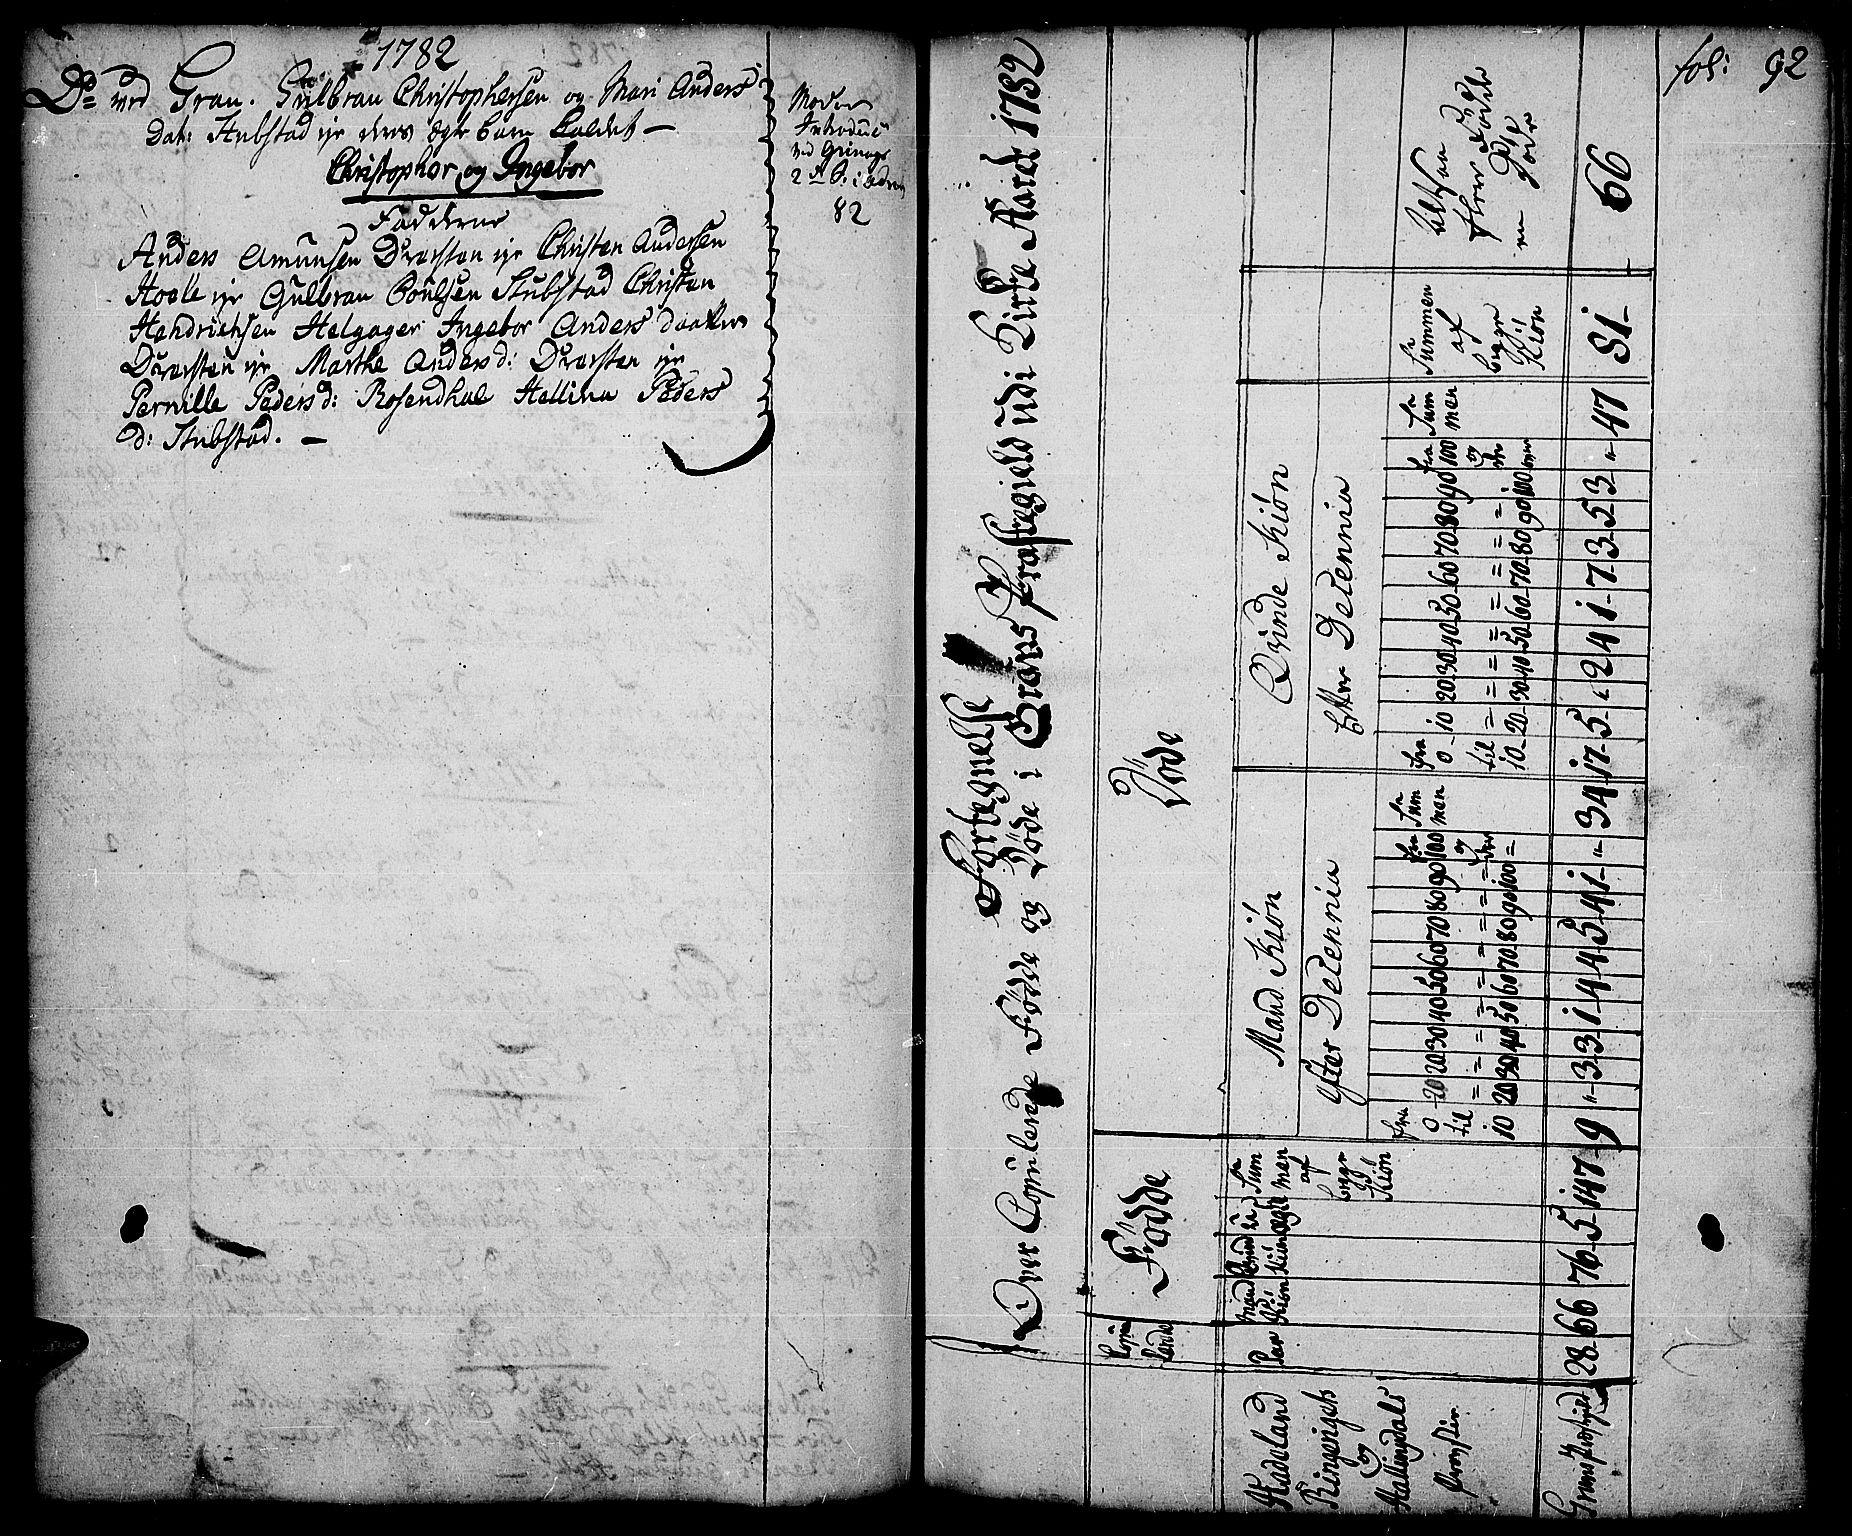 SAH, Gran prestekontor, Ministerialbok nr. 5, 1776-1788, s. 92